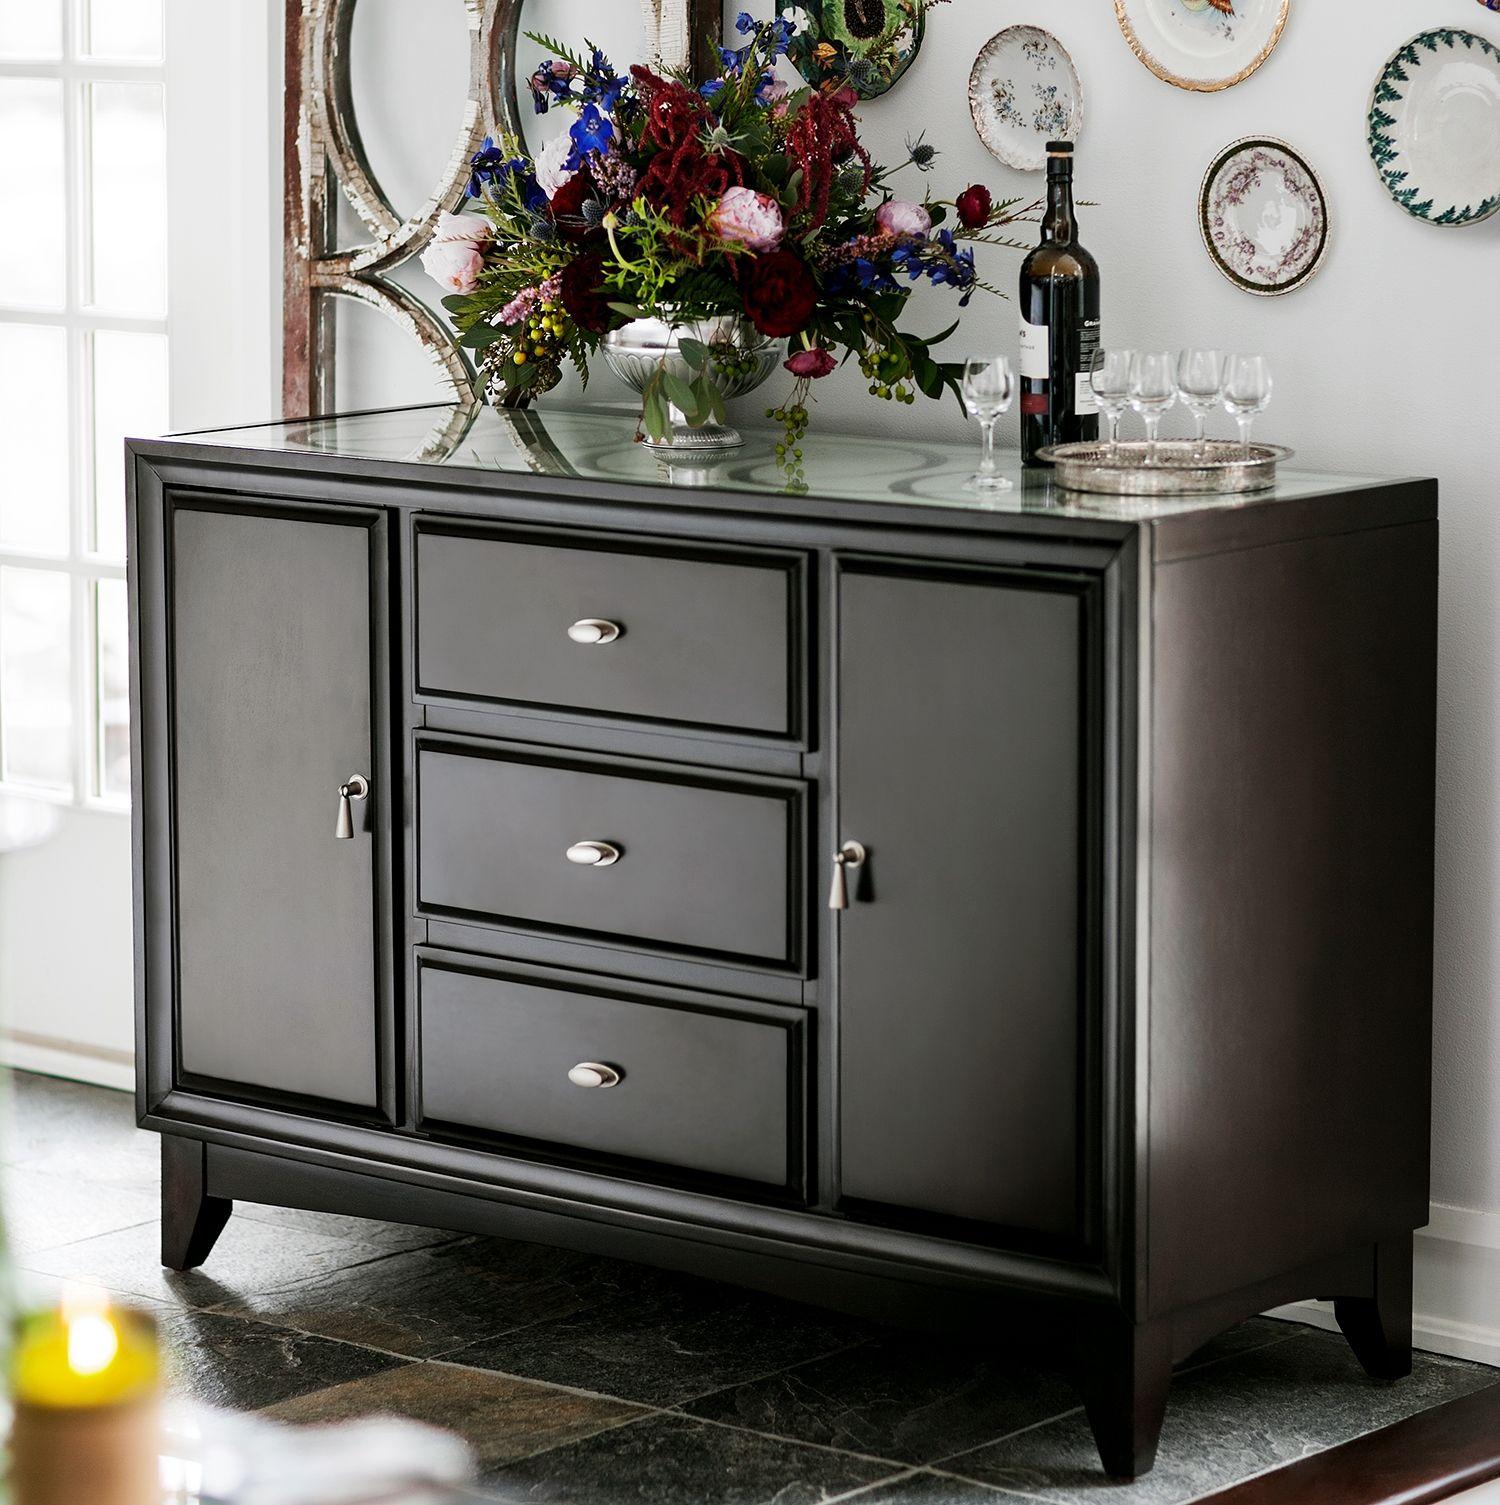 Cosmo Sideboard Furniture, Dining room sideboard, Ashley